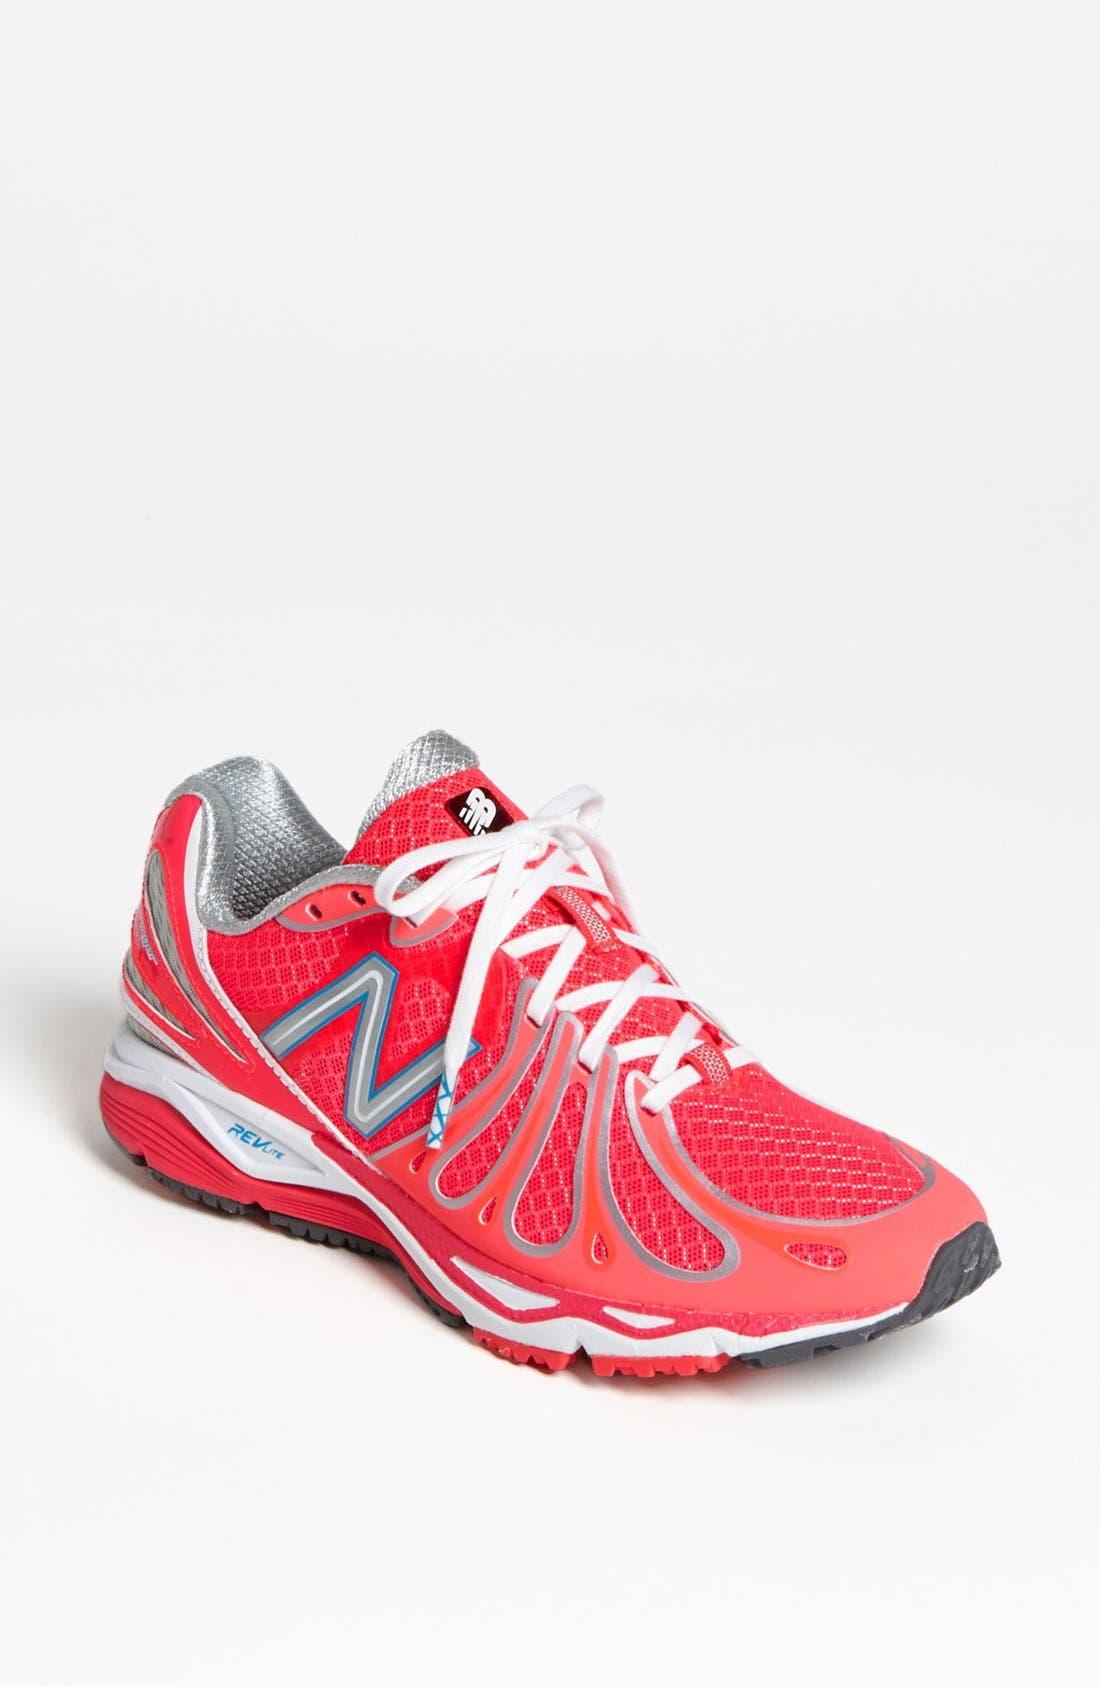 Alternate Image 1 Selected - New Balance '890V3' Running Shoe (Women) (Regular Retail Price: $109.95)